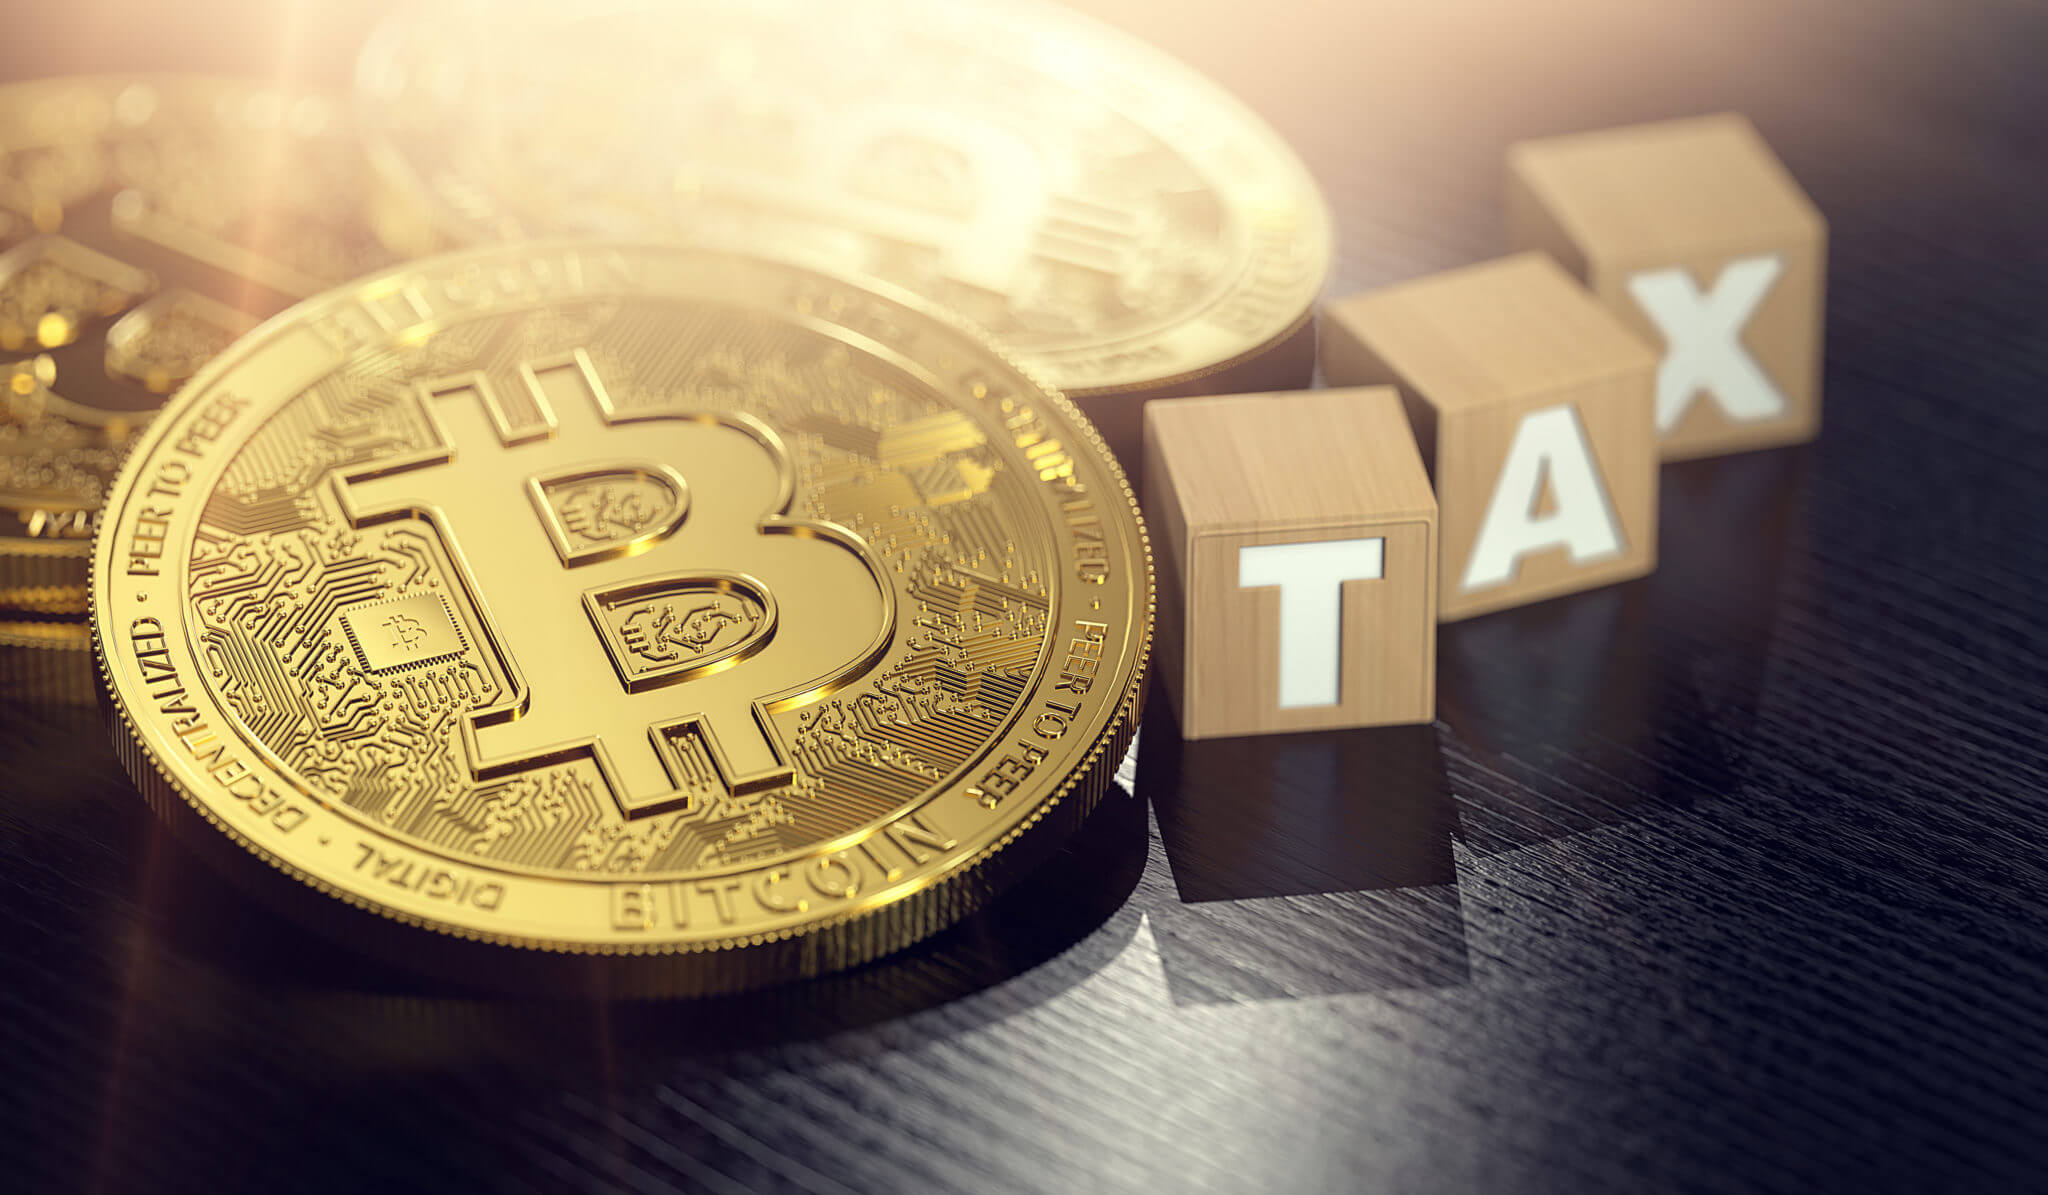 Kripto Para Vergilendirilebilir mi? 1 - Kripto Para Vergi